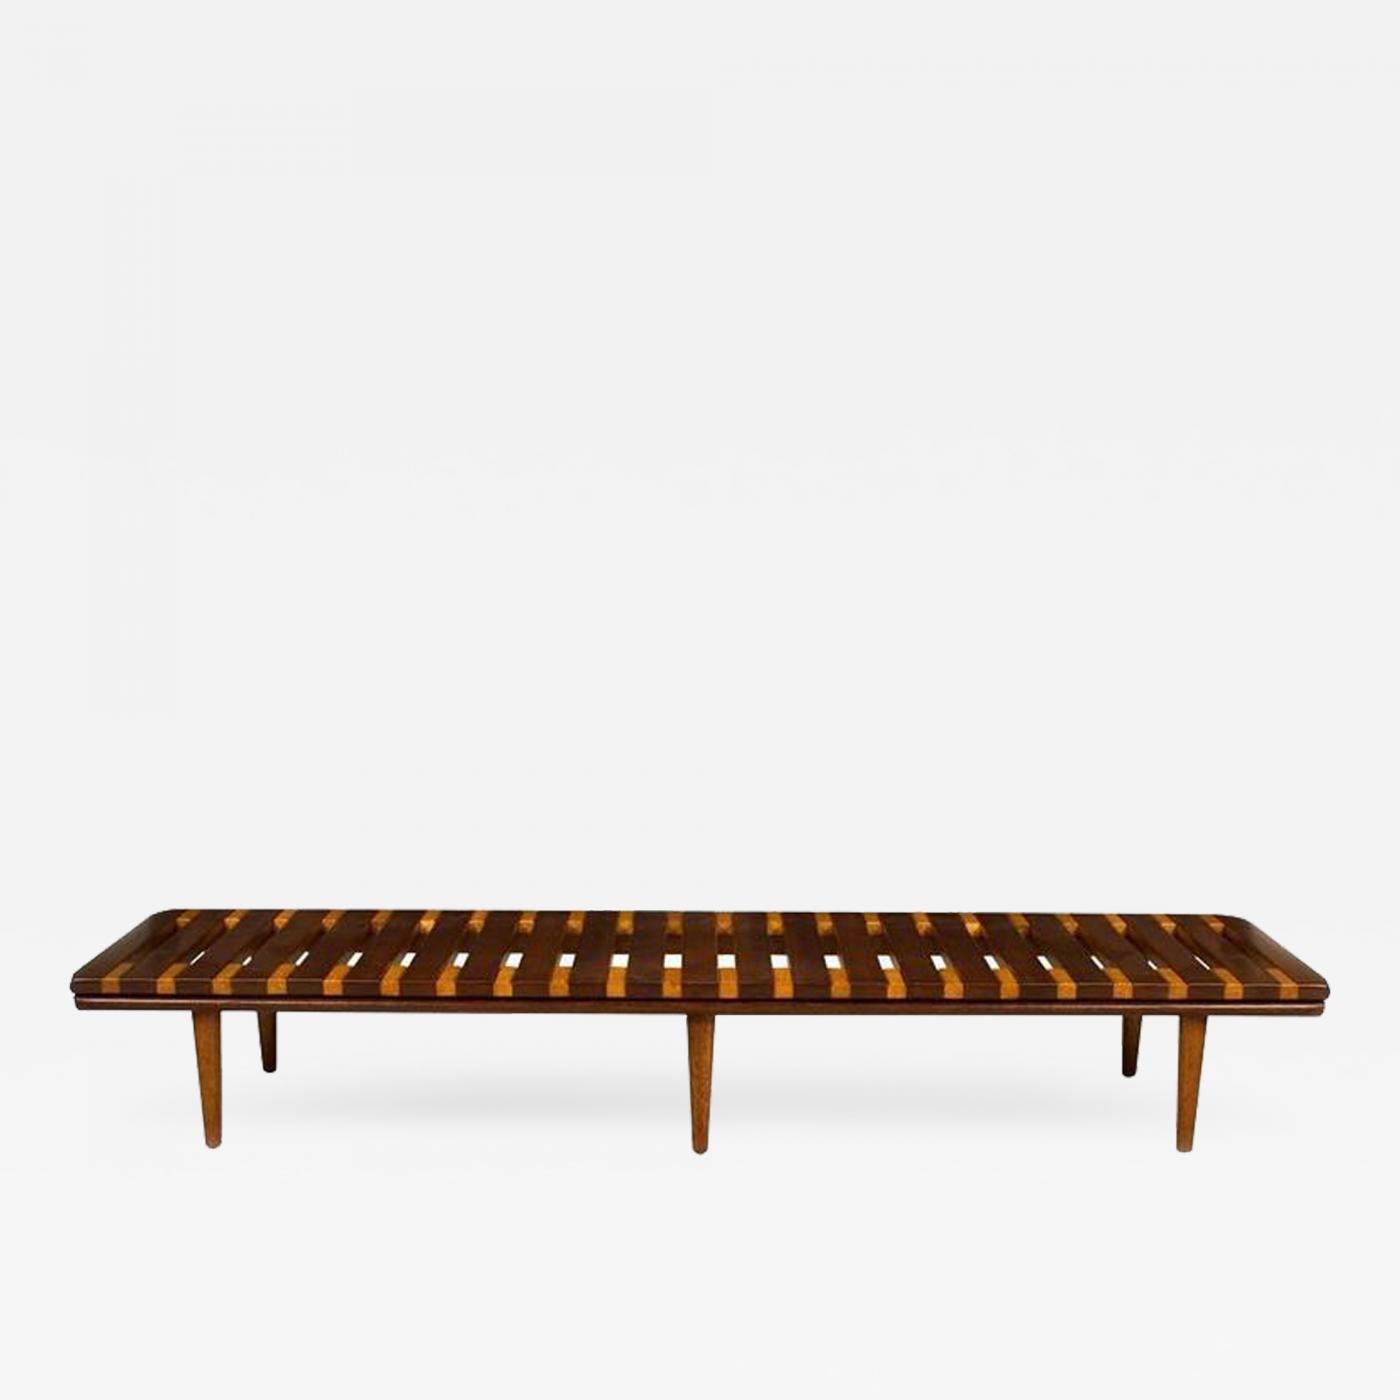 John Keal John Keal Low Table or Bench by Brown Saltman